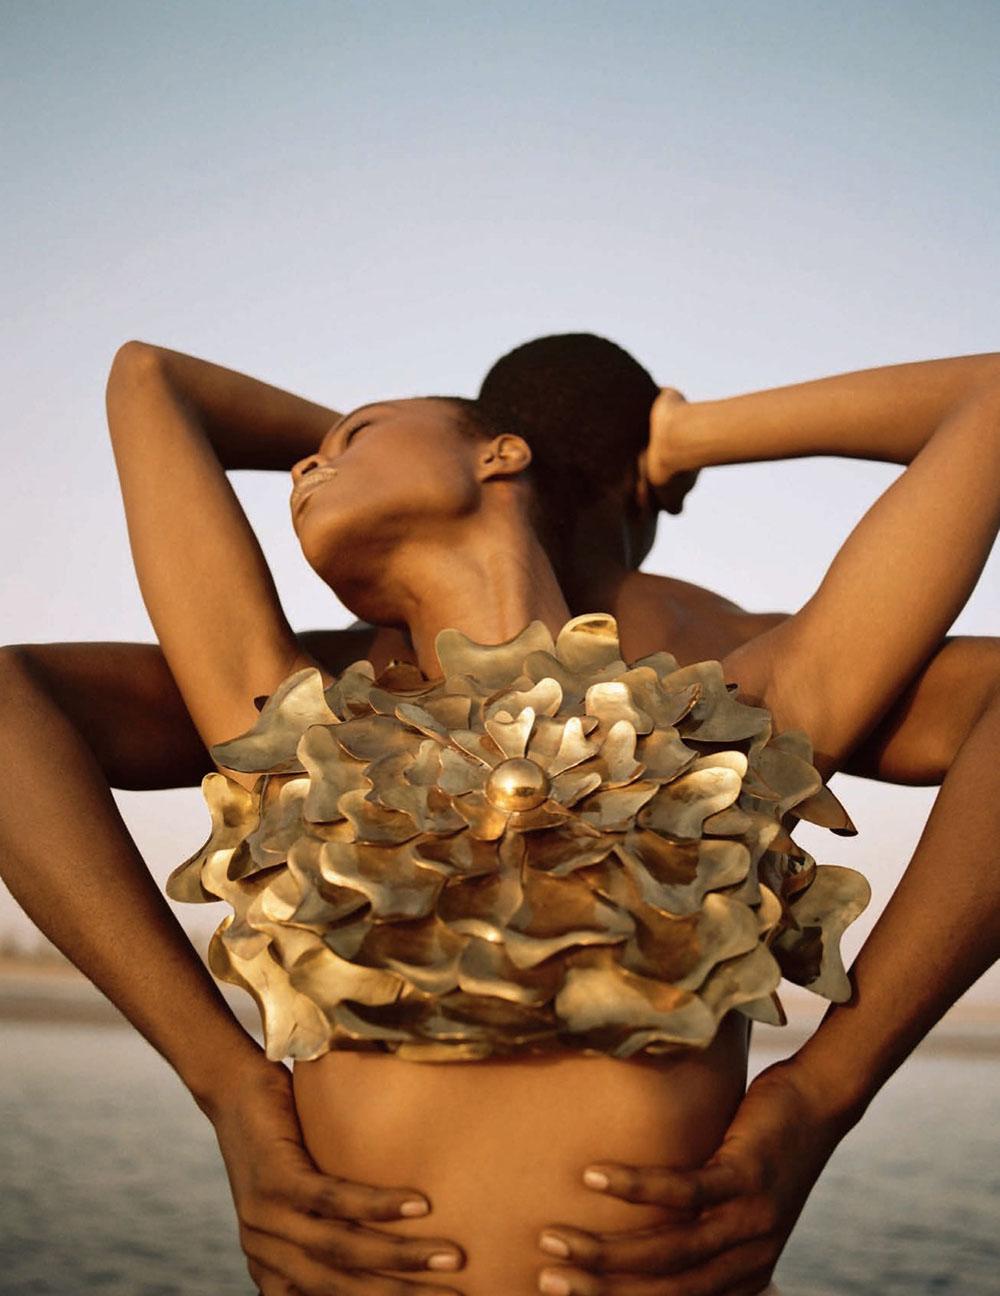 Mayowa Nicholas by Dan Beleiu for Vogue Spain April 2020